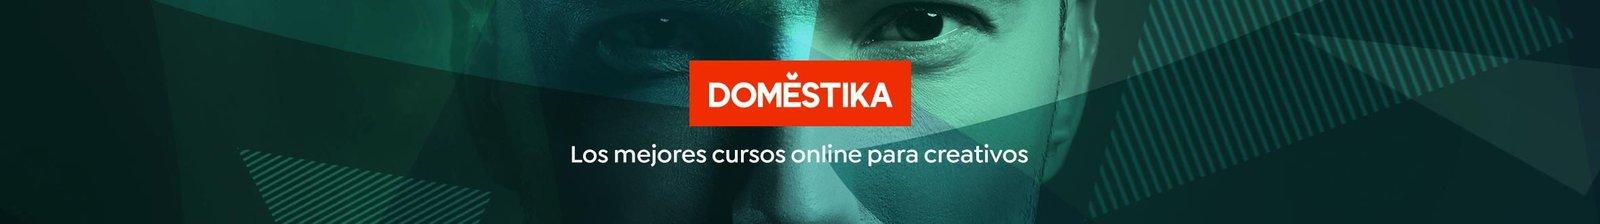 cursos virtuales domestika